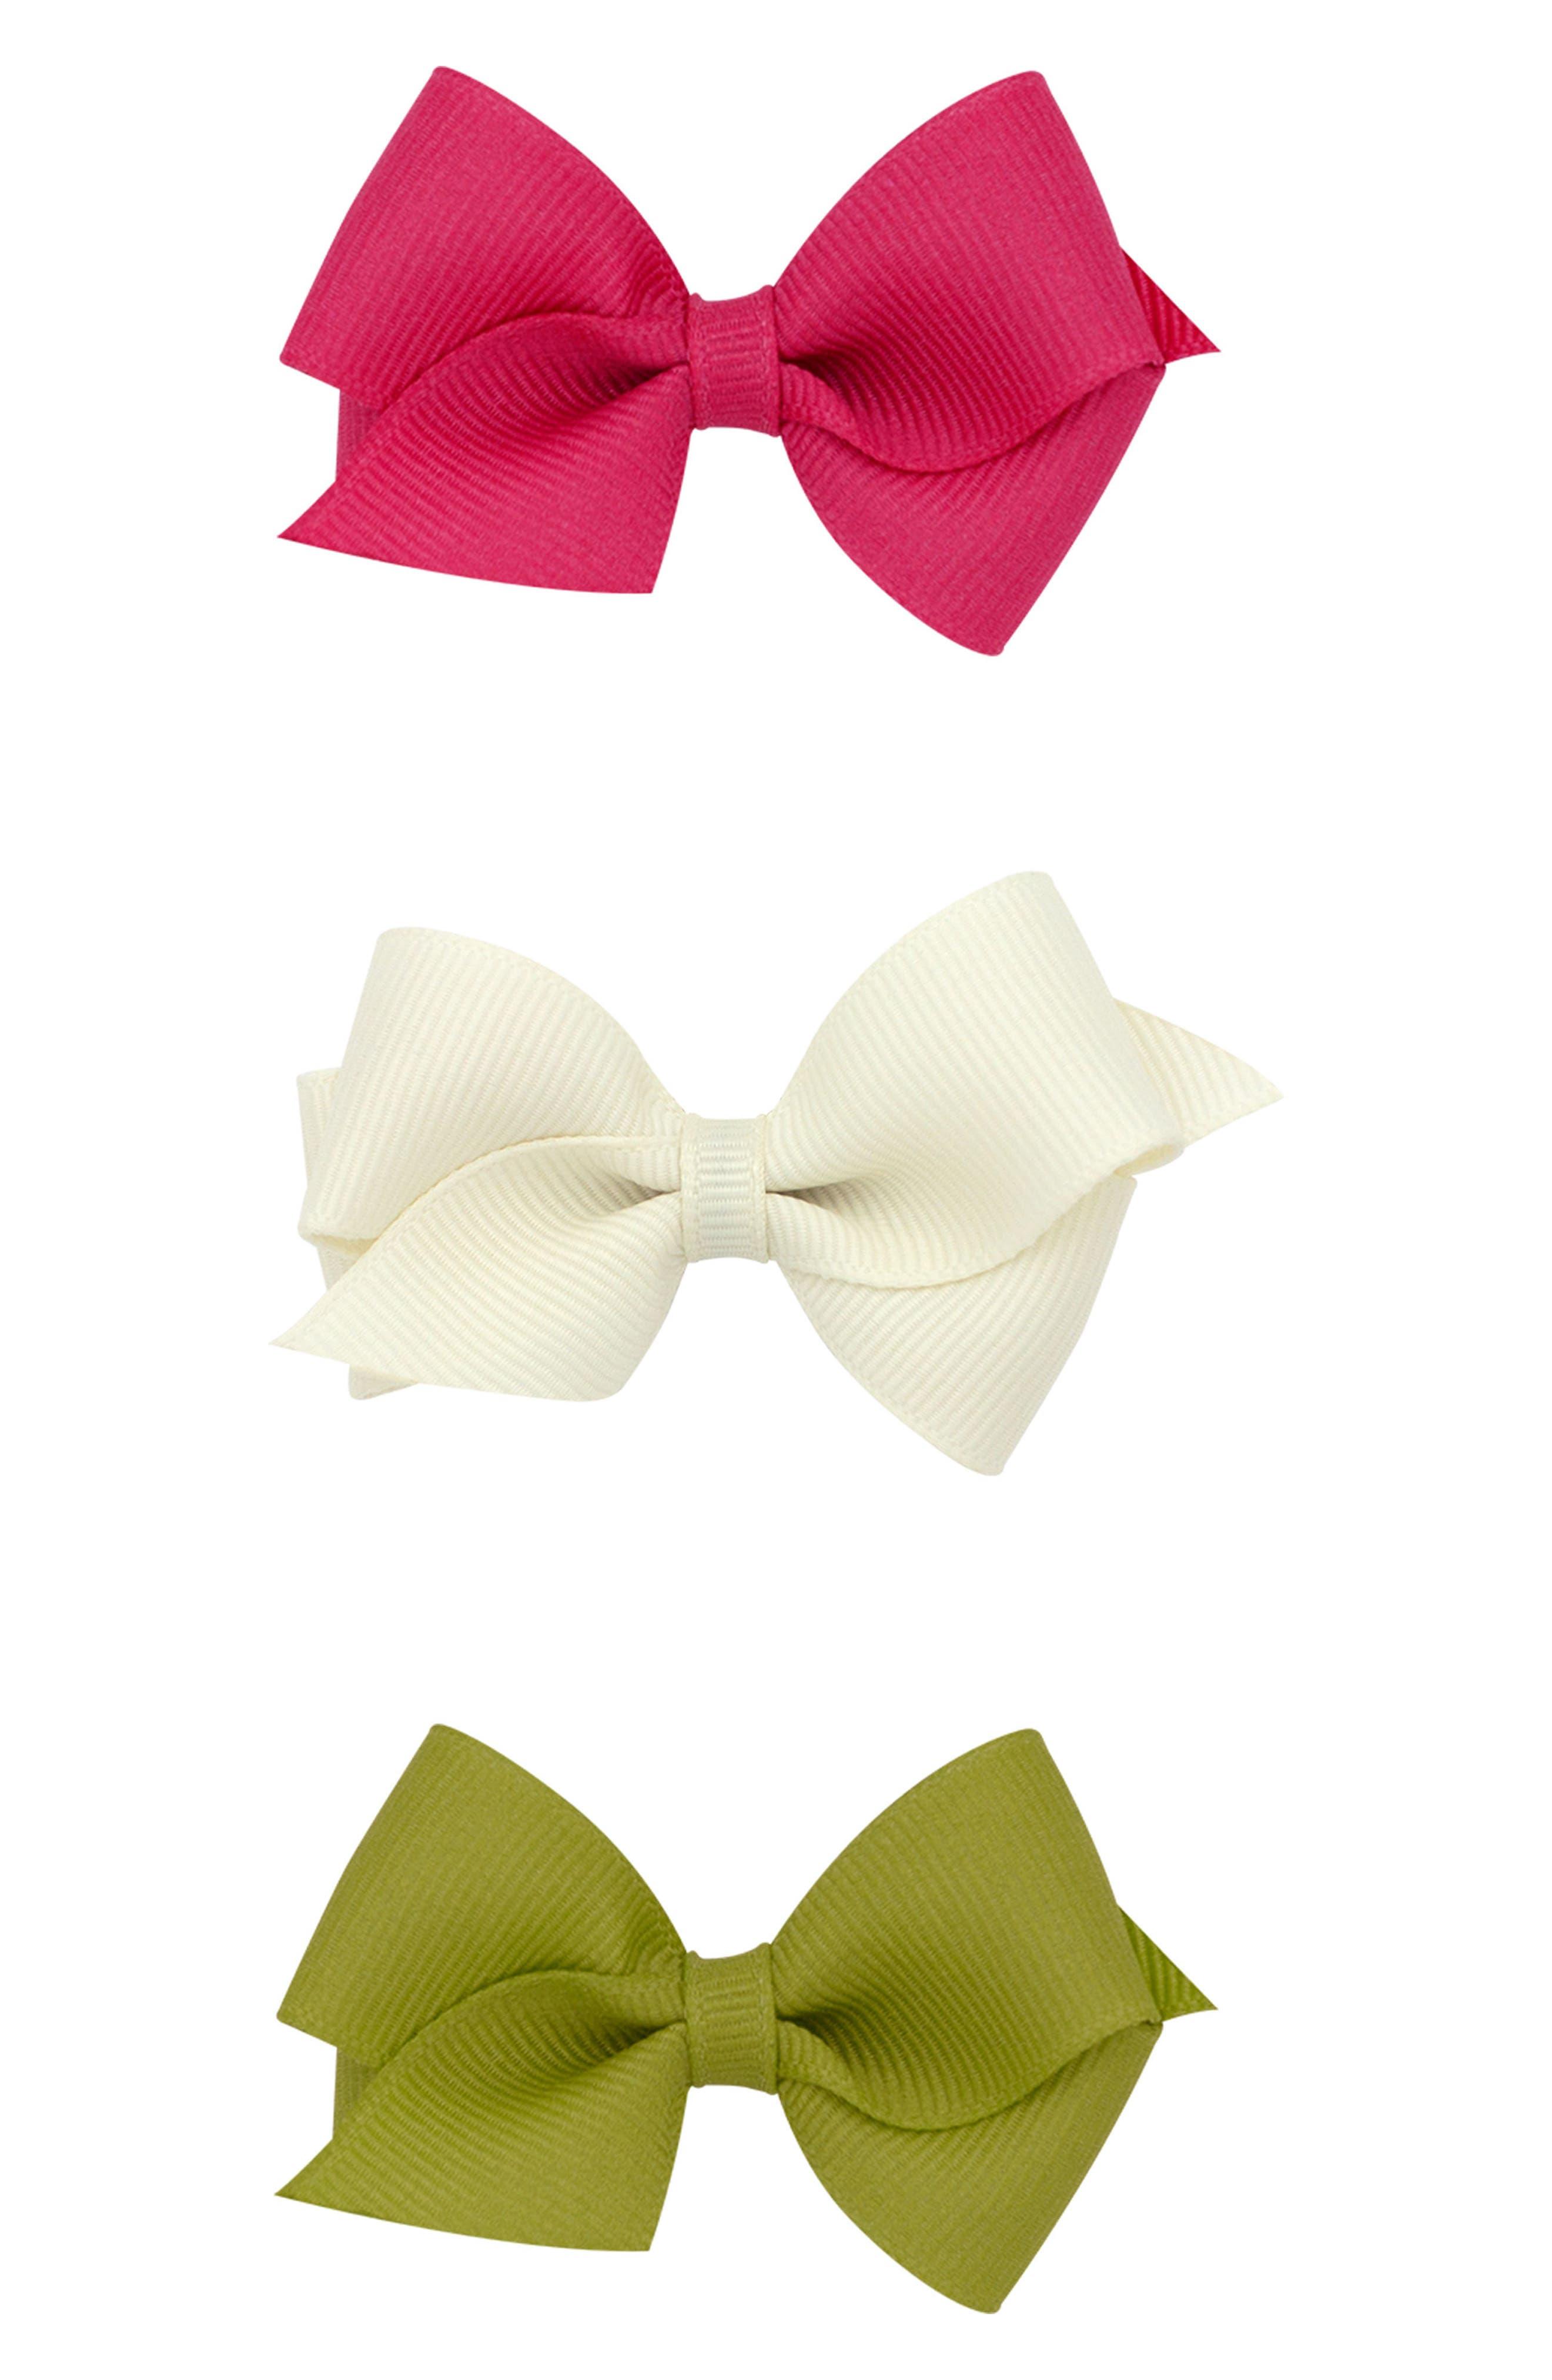 Set of 3 Wee Bow Hair Clips,                             Main thumbnail 1, color,                             300